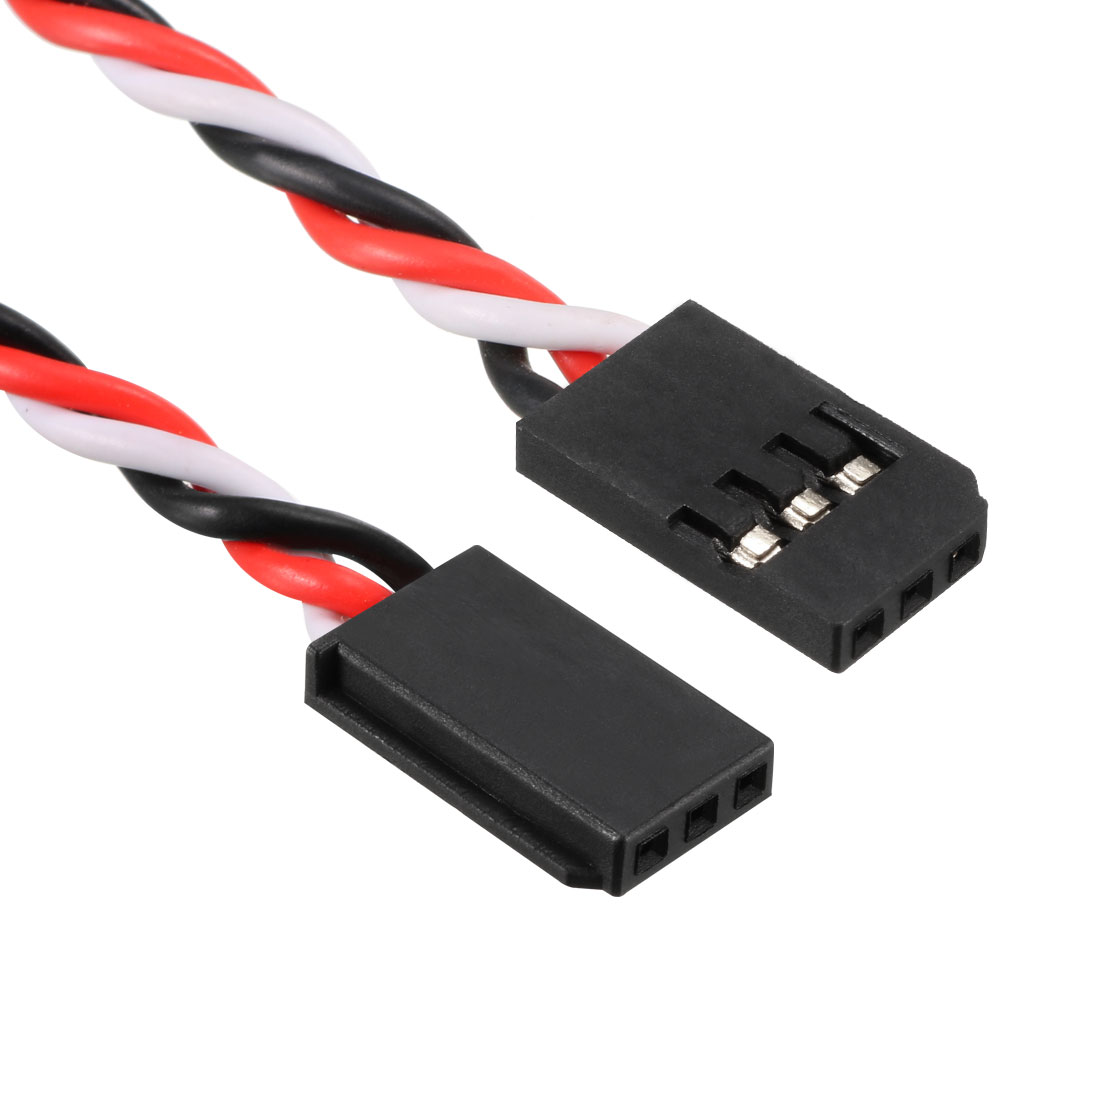 5Pcs 100mm Servo Extension Cable Anti-reverse Plug 60 Core RC Futaba Lock